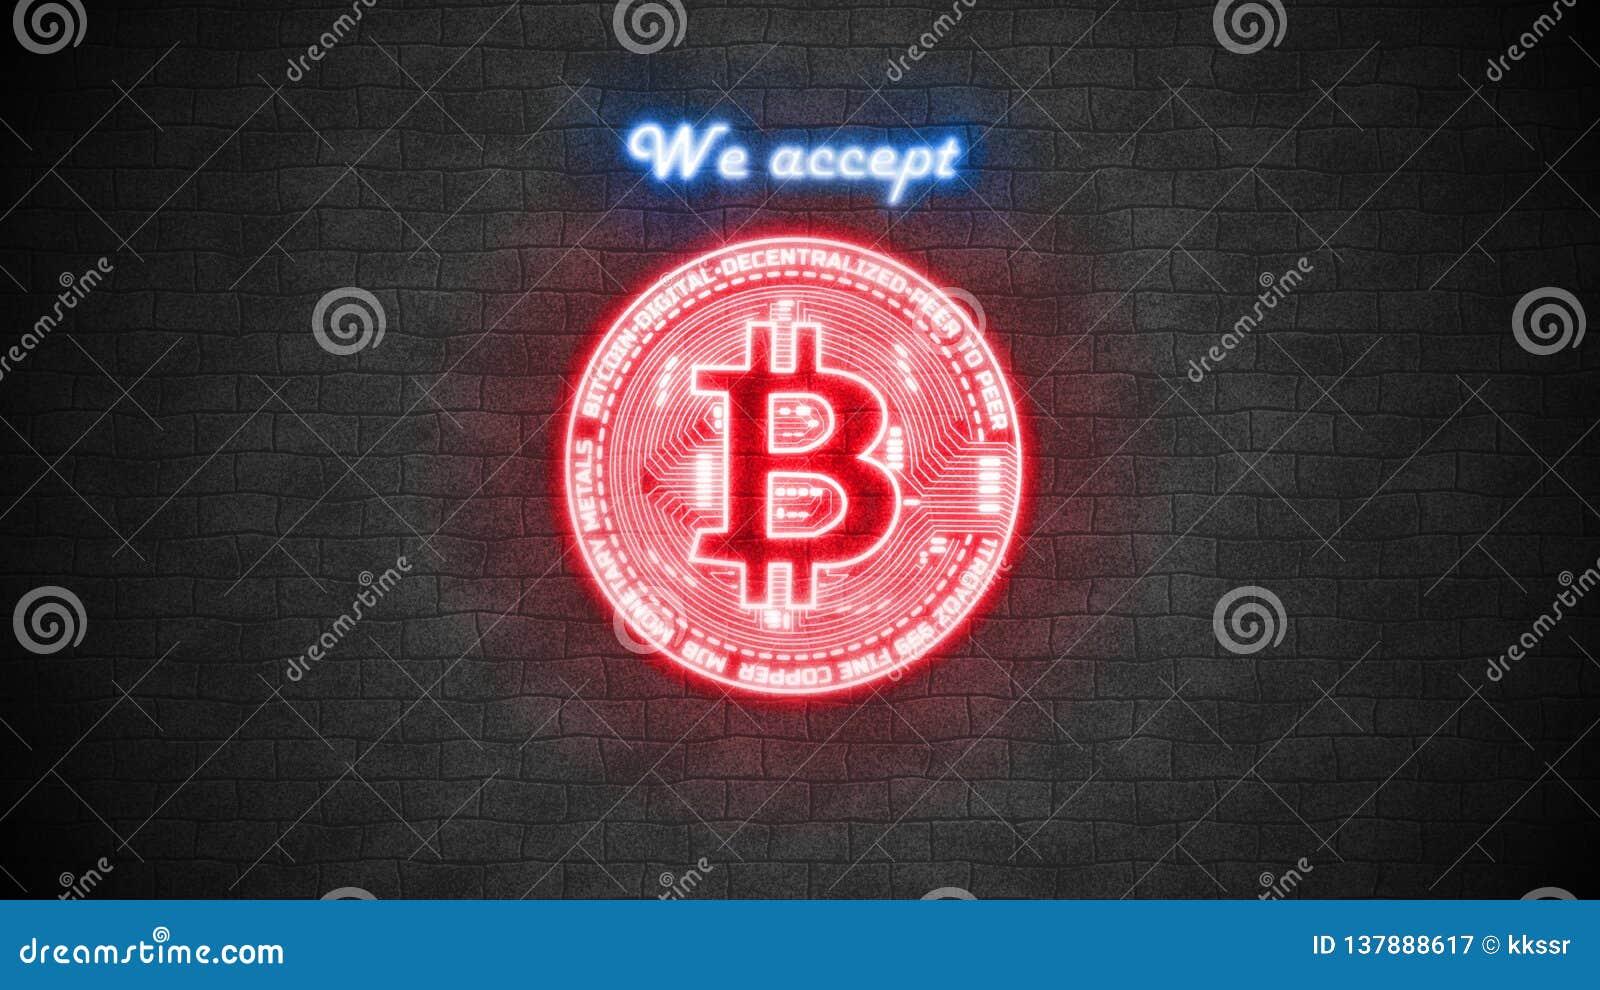 the cash bitcoin club